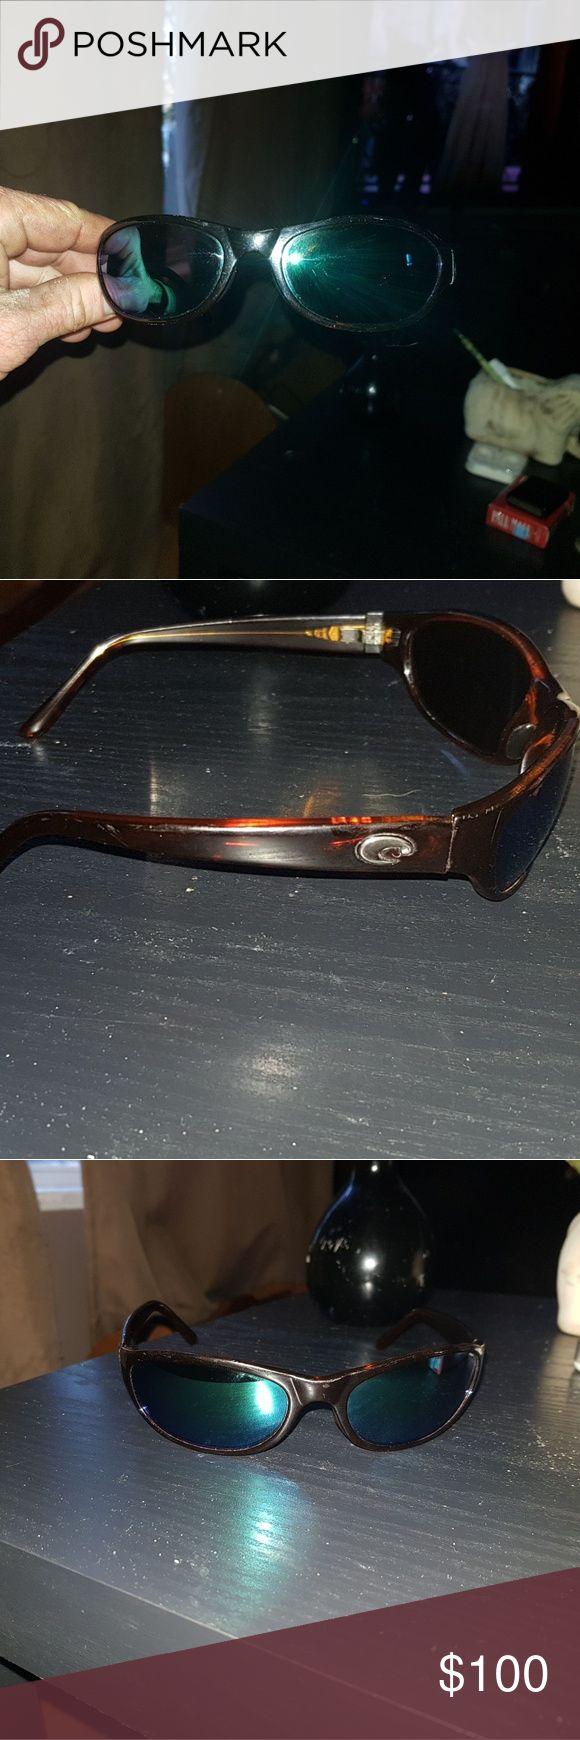 Costa Del Mar Harpoon Sunglasses 1 yr old. Has a few scratches on the plastic frames. costa del mar Accessories Glasses